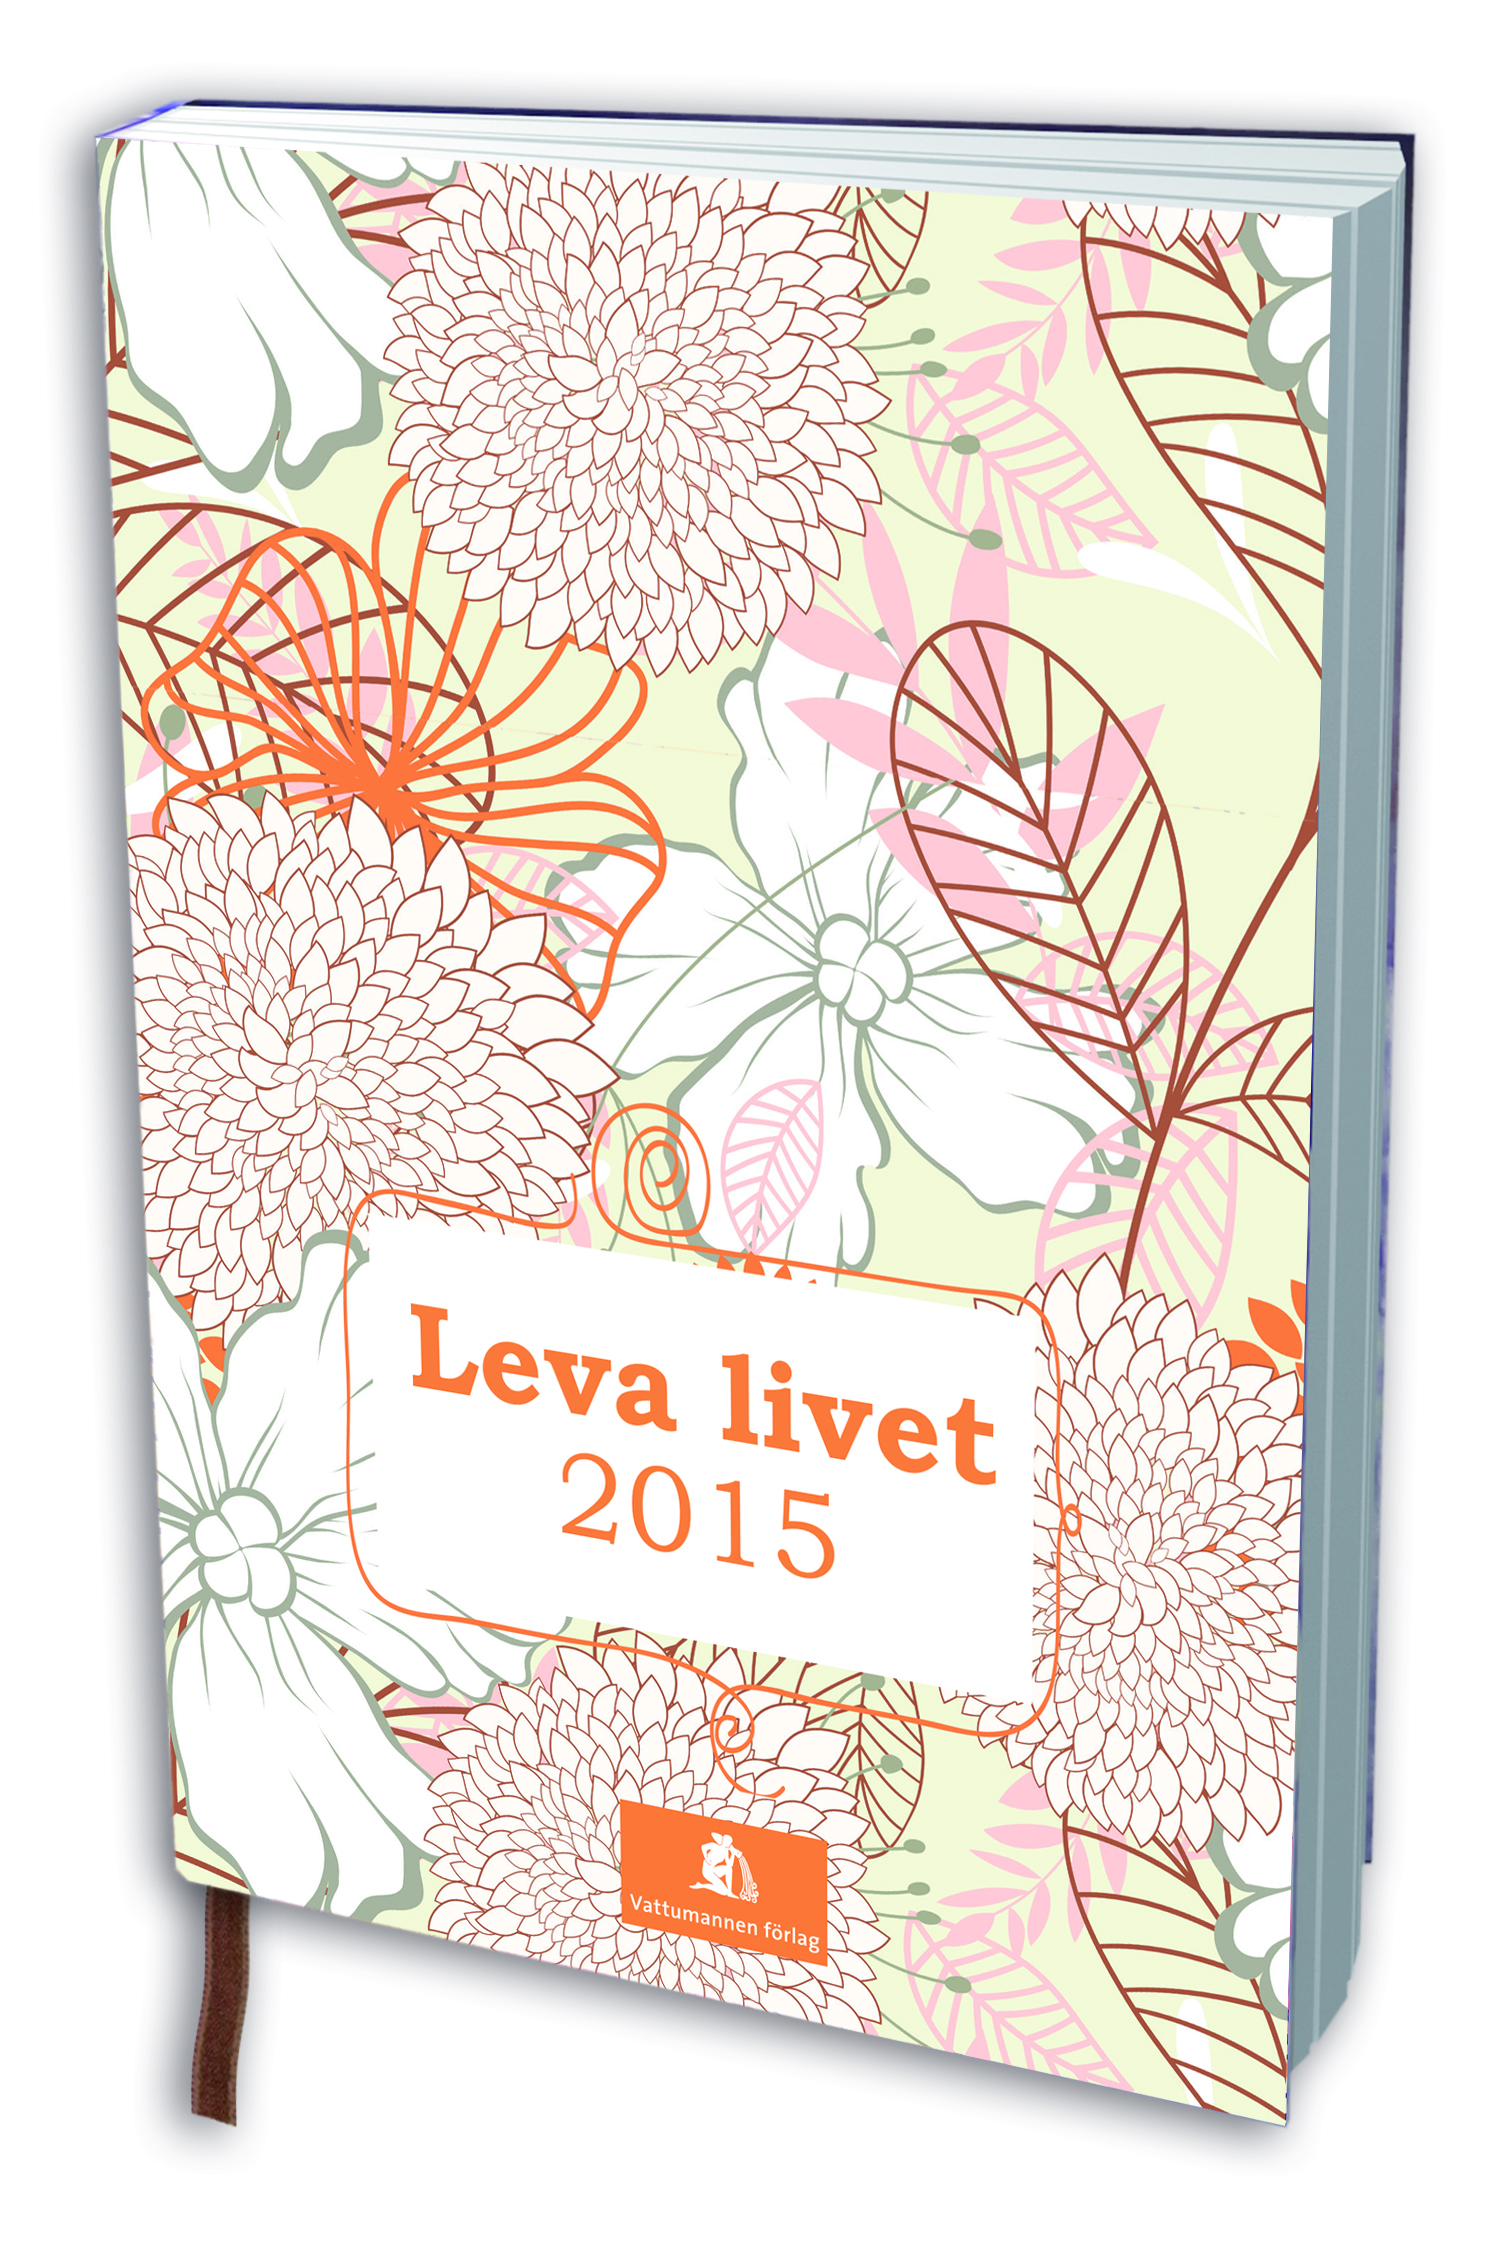 levalivet2015_vama_3d_85640